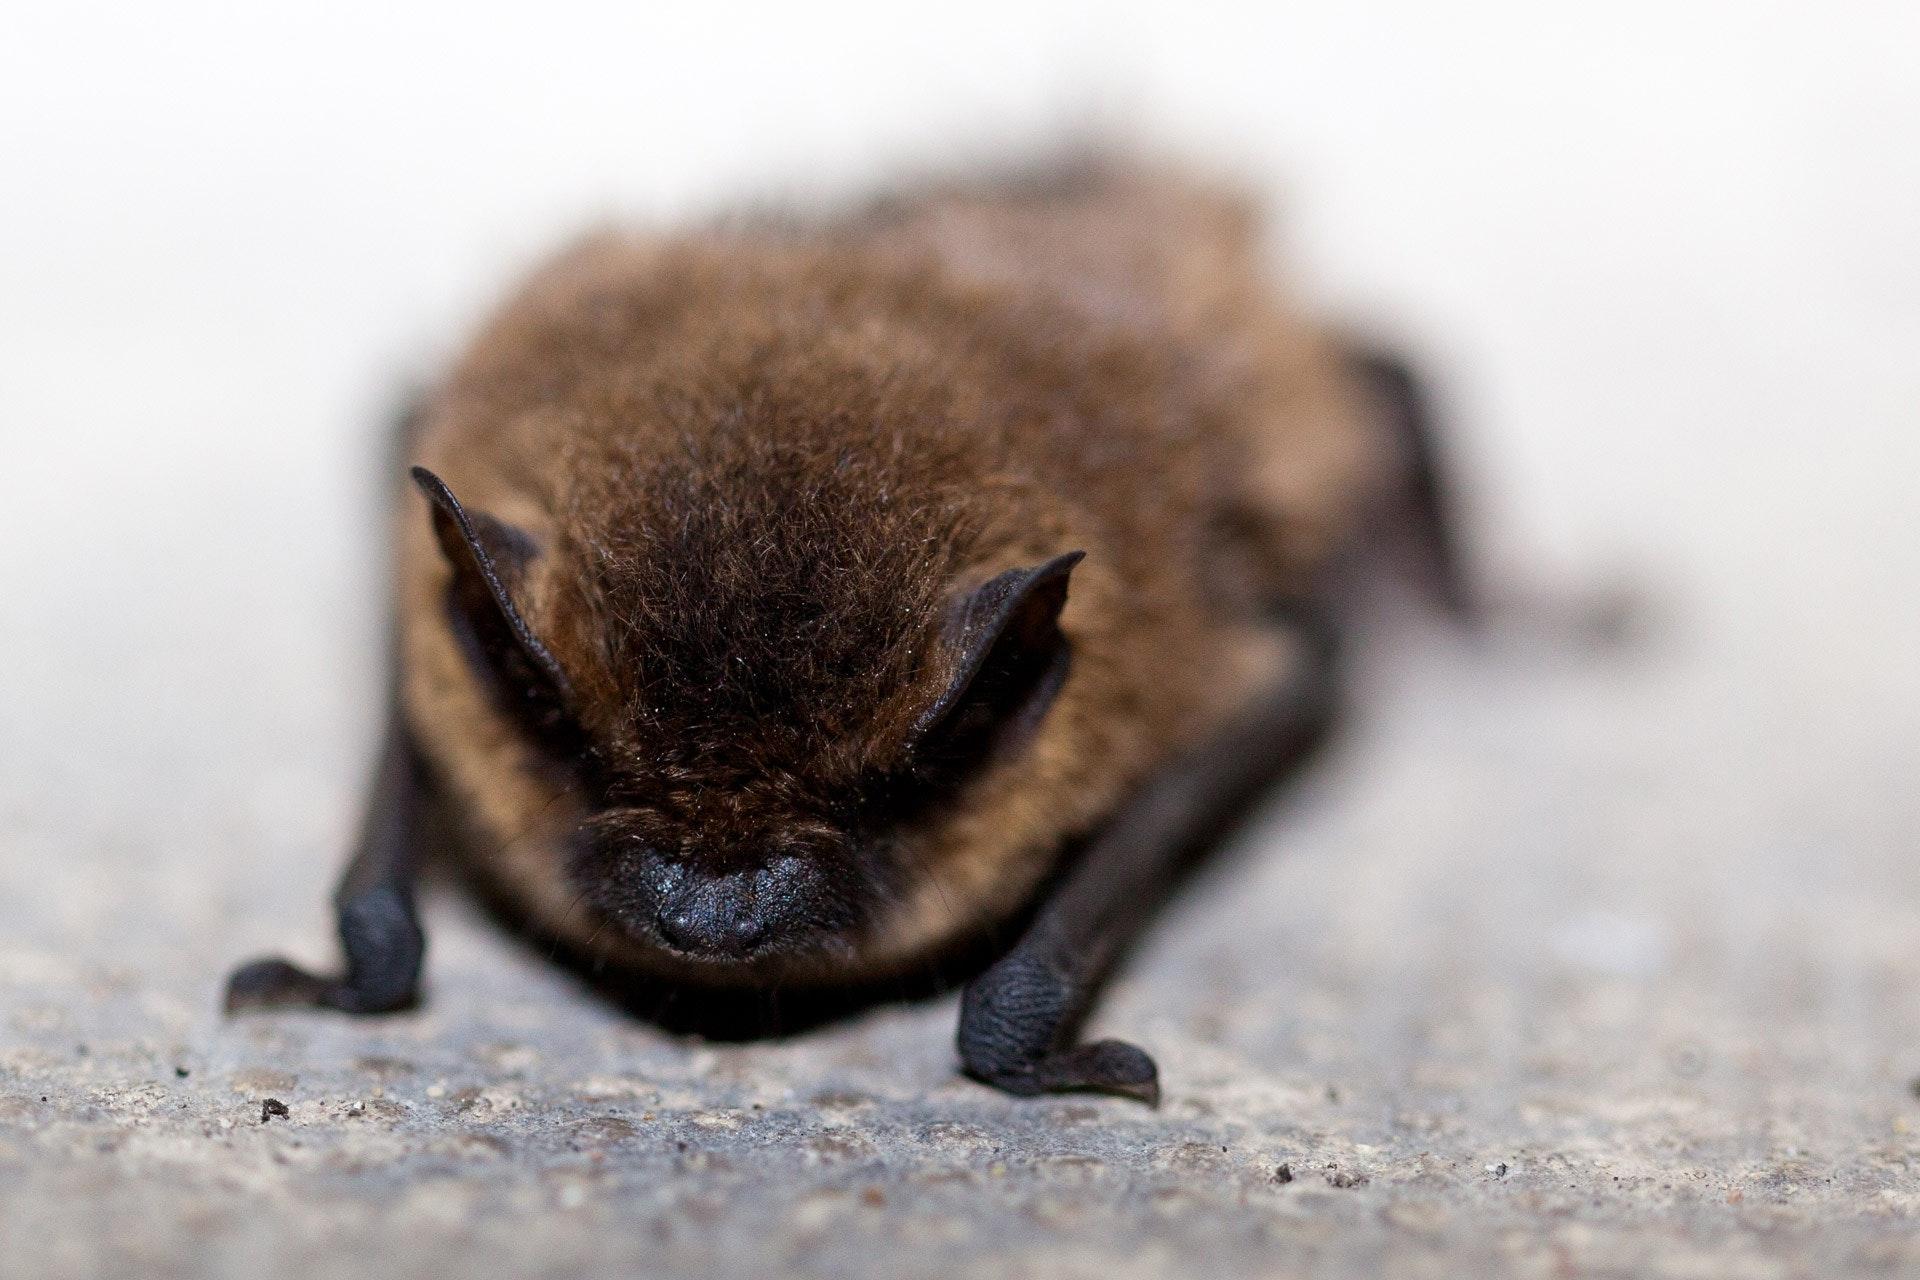 A black and dark brown bat facing the camera